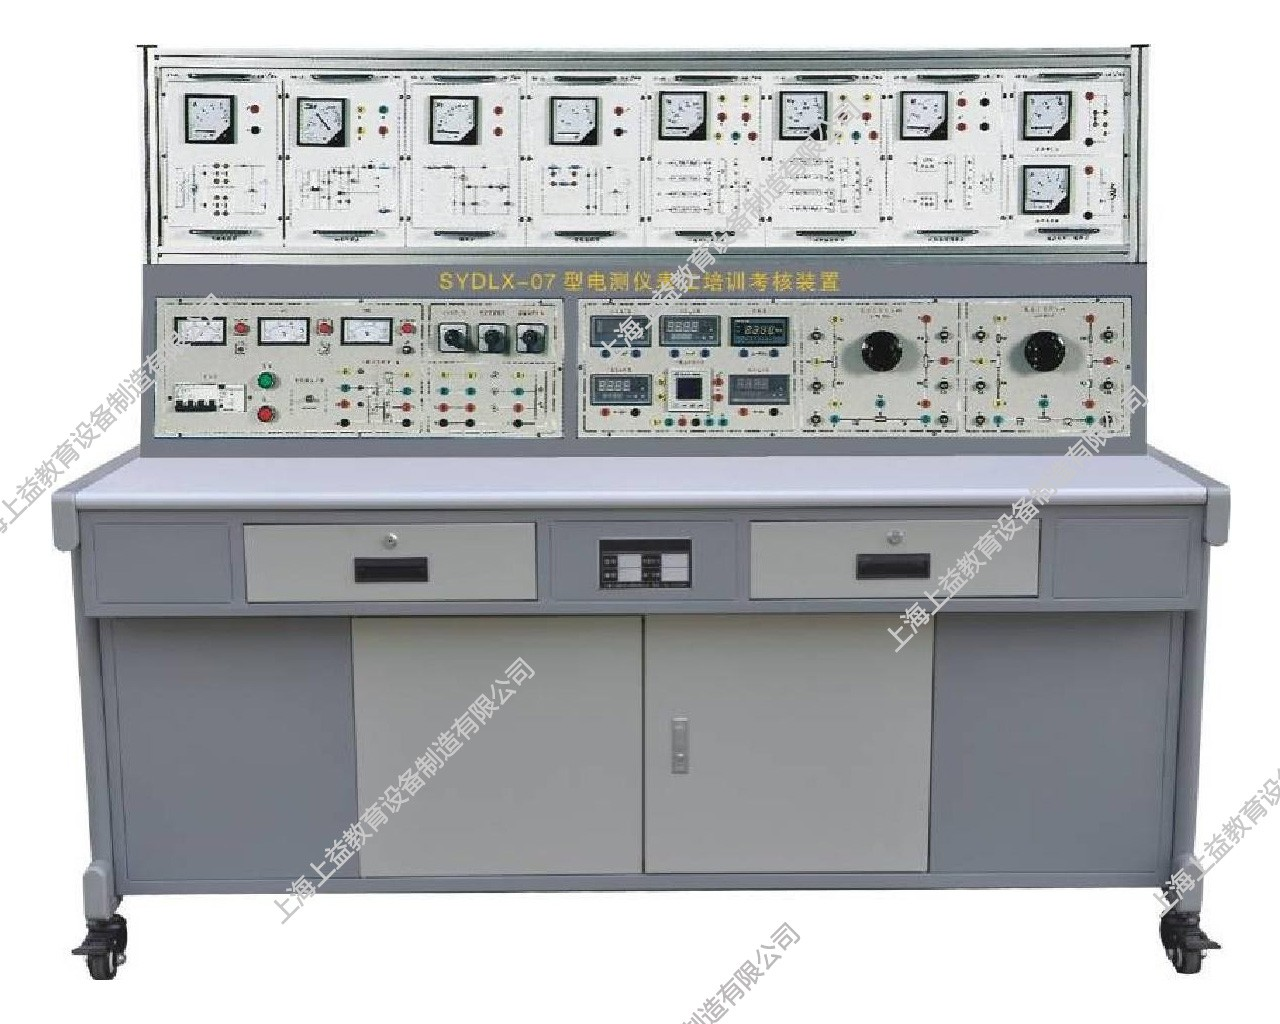 SYDLX-07电测仪表工培训lehu68vip装置